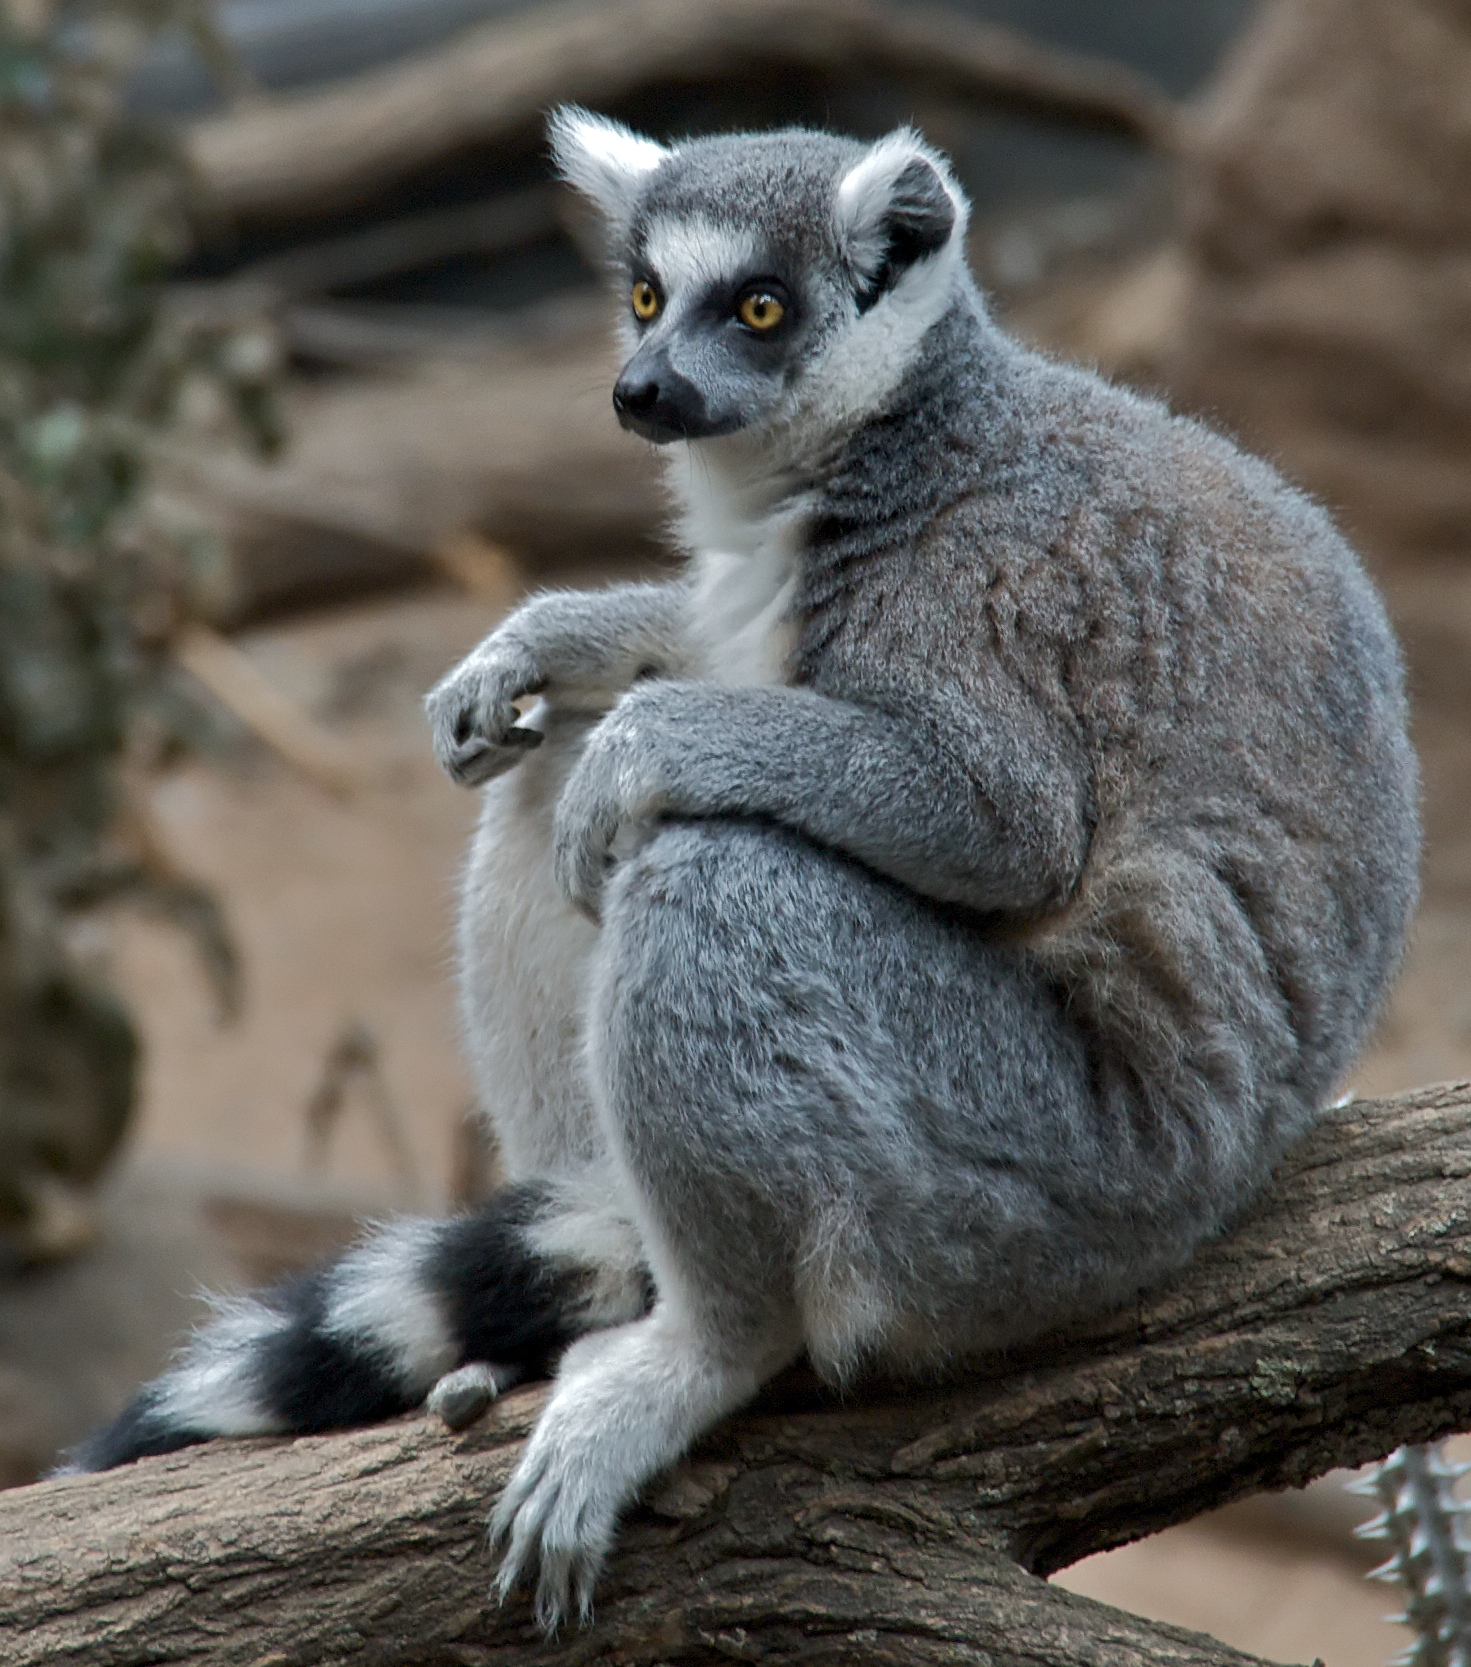 ring_tailed_lemur_lemur_catta_at_bronx_zoo_1_cropped.jpg